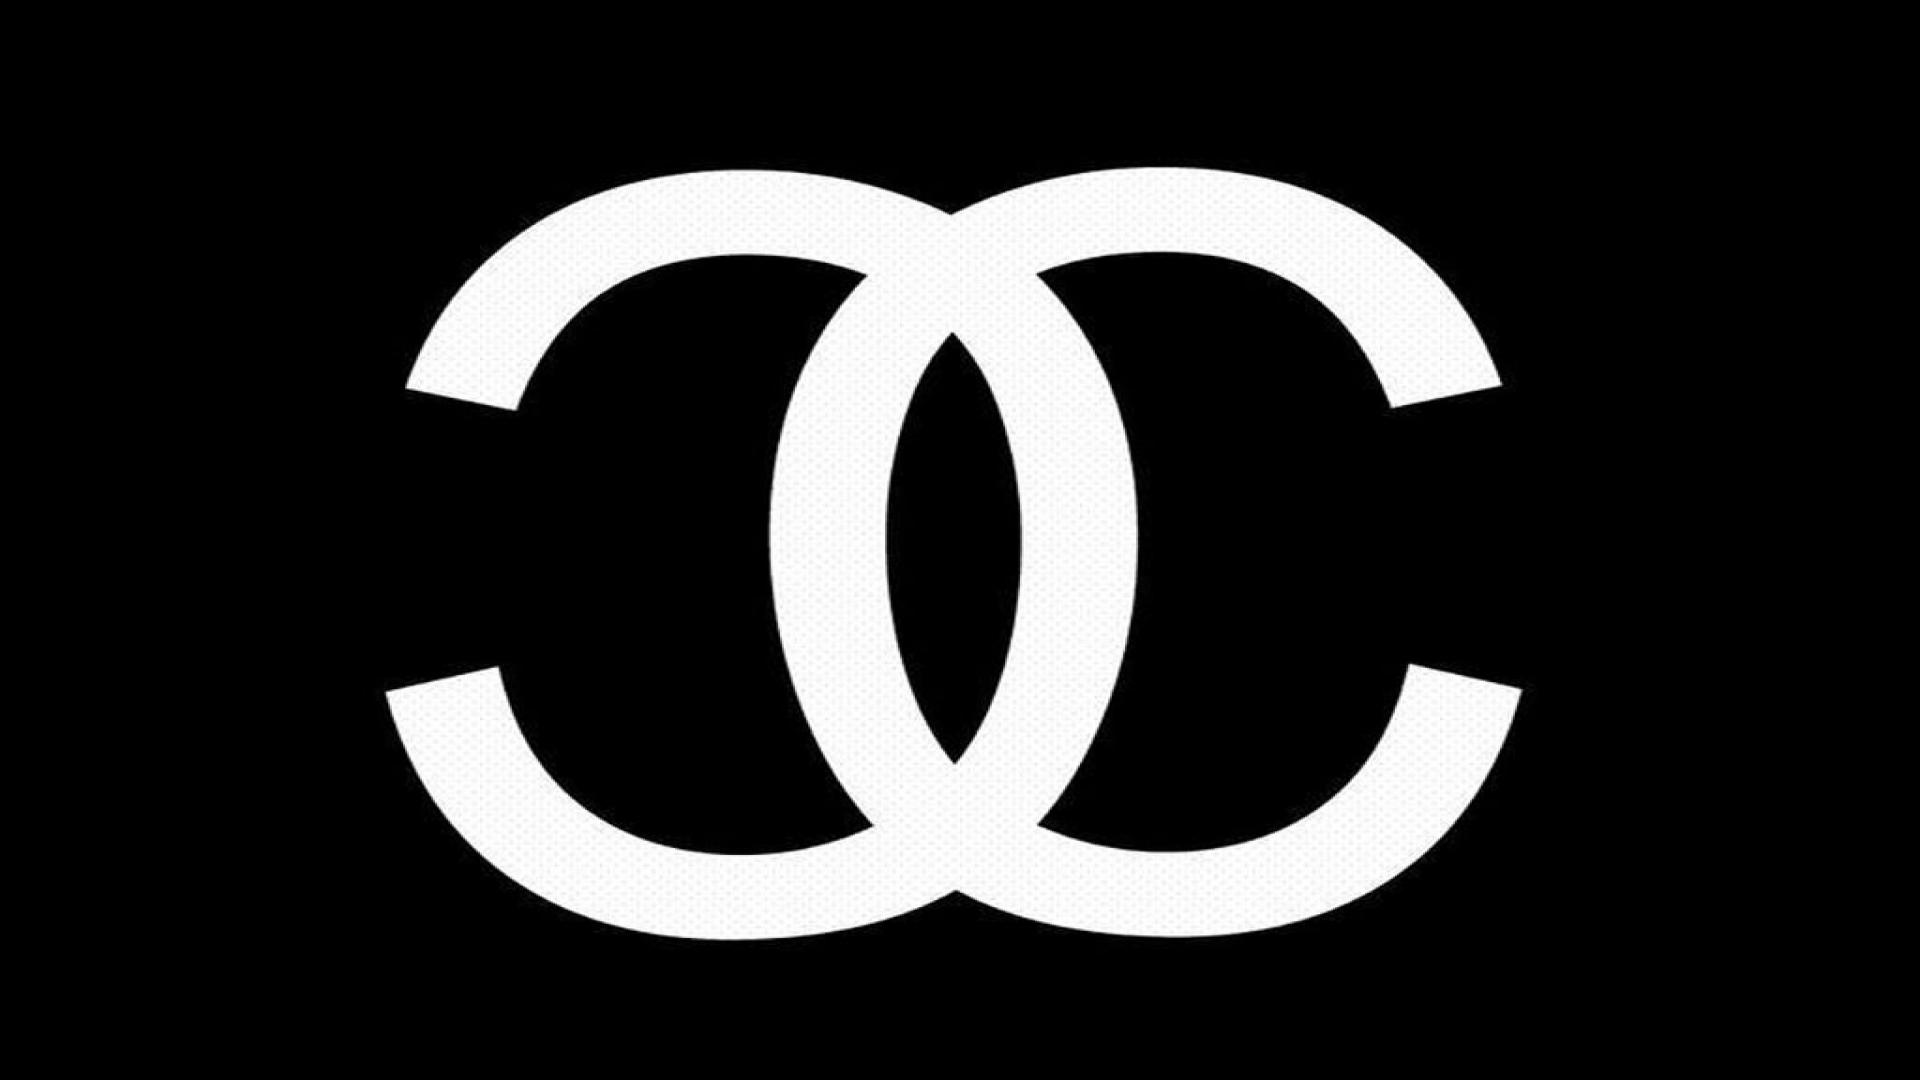 Download HD Chanel Wallpaper WallpaperMinecom 1920x1080